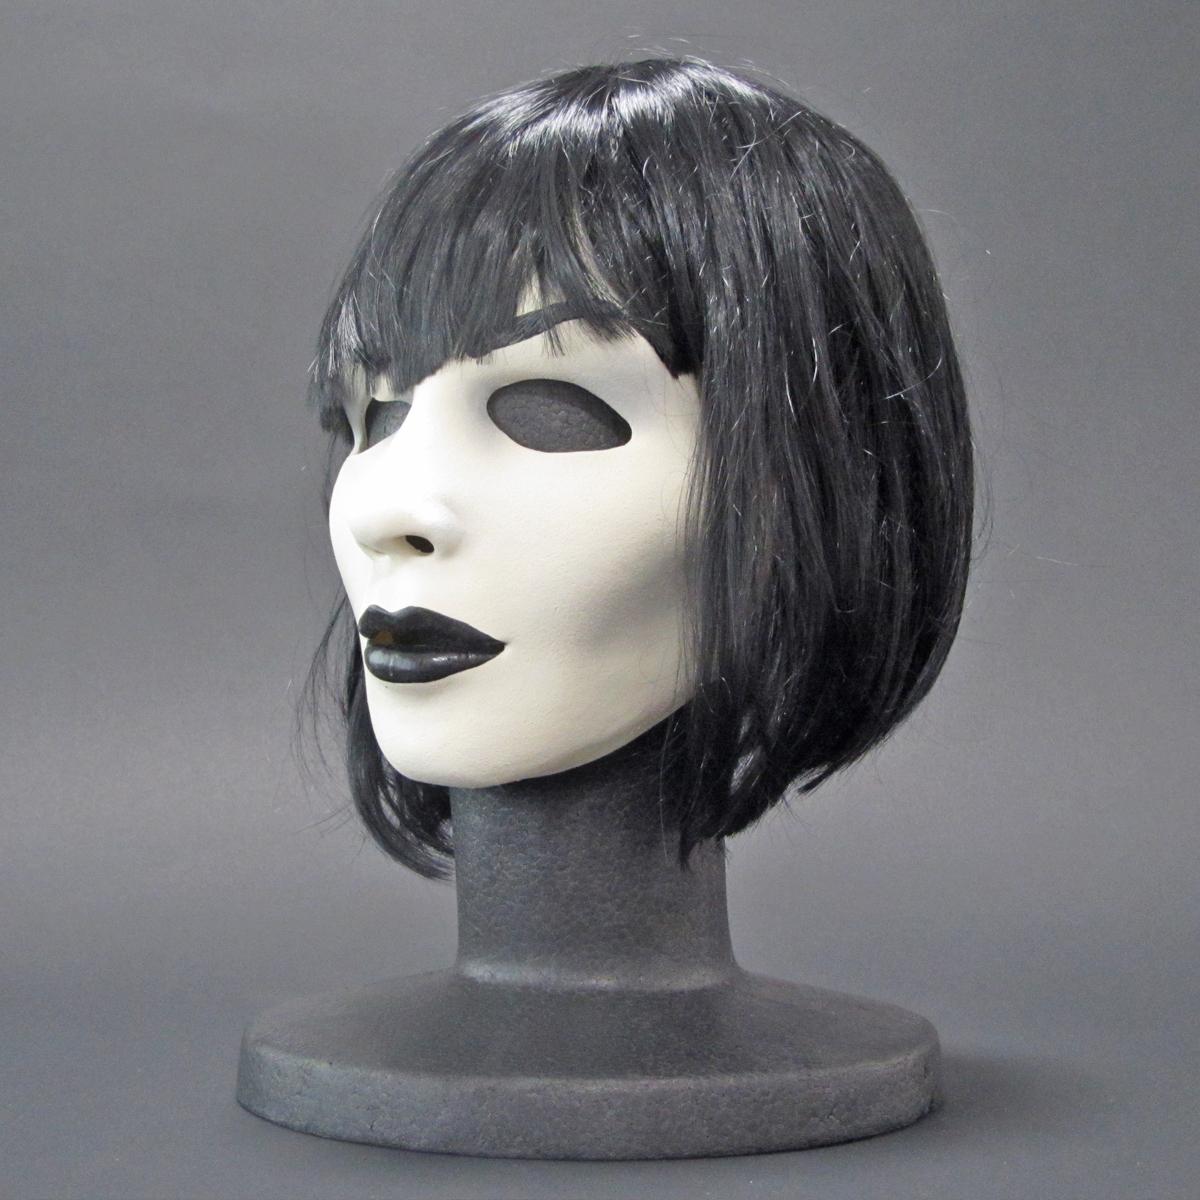 <Hot Goth>Zagone Studios ザゴーニ スタジオ マスク ハロウィン コスプレ ホラー イベント 女装 仮装 ハンドメイド アメリカ製 正規品_画像1